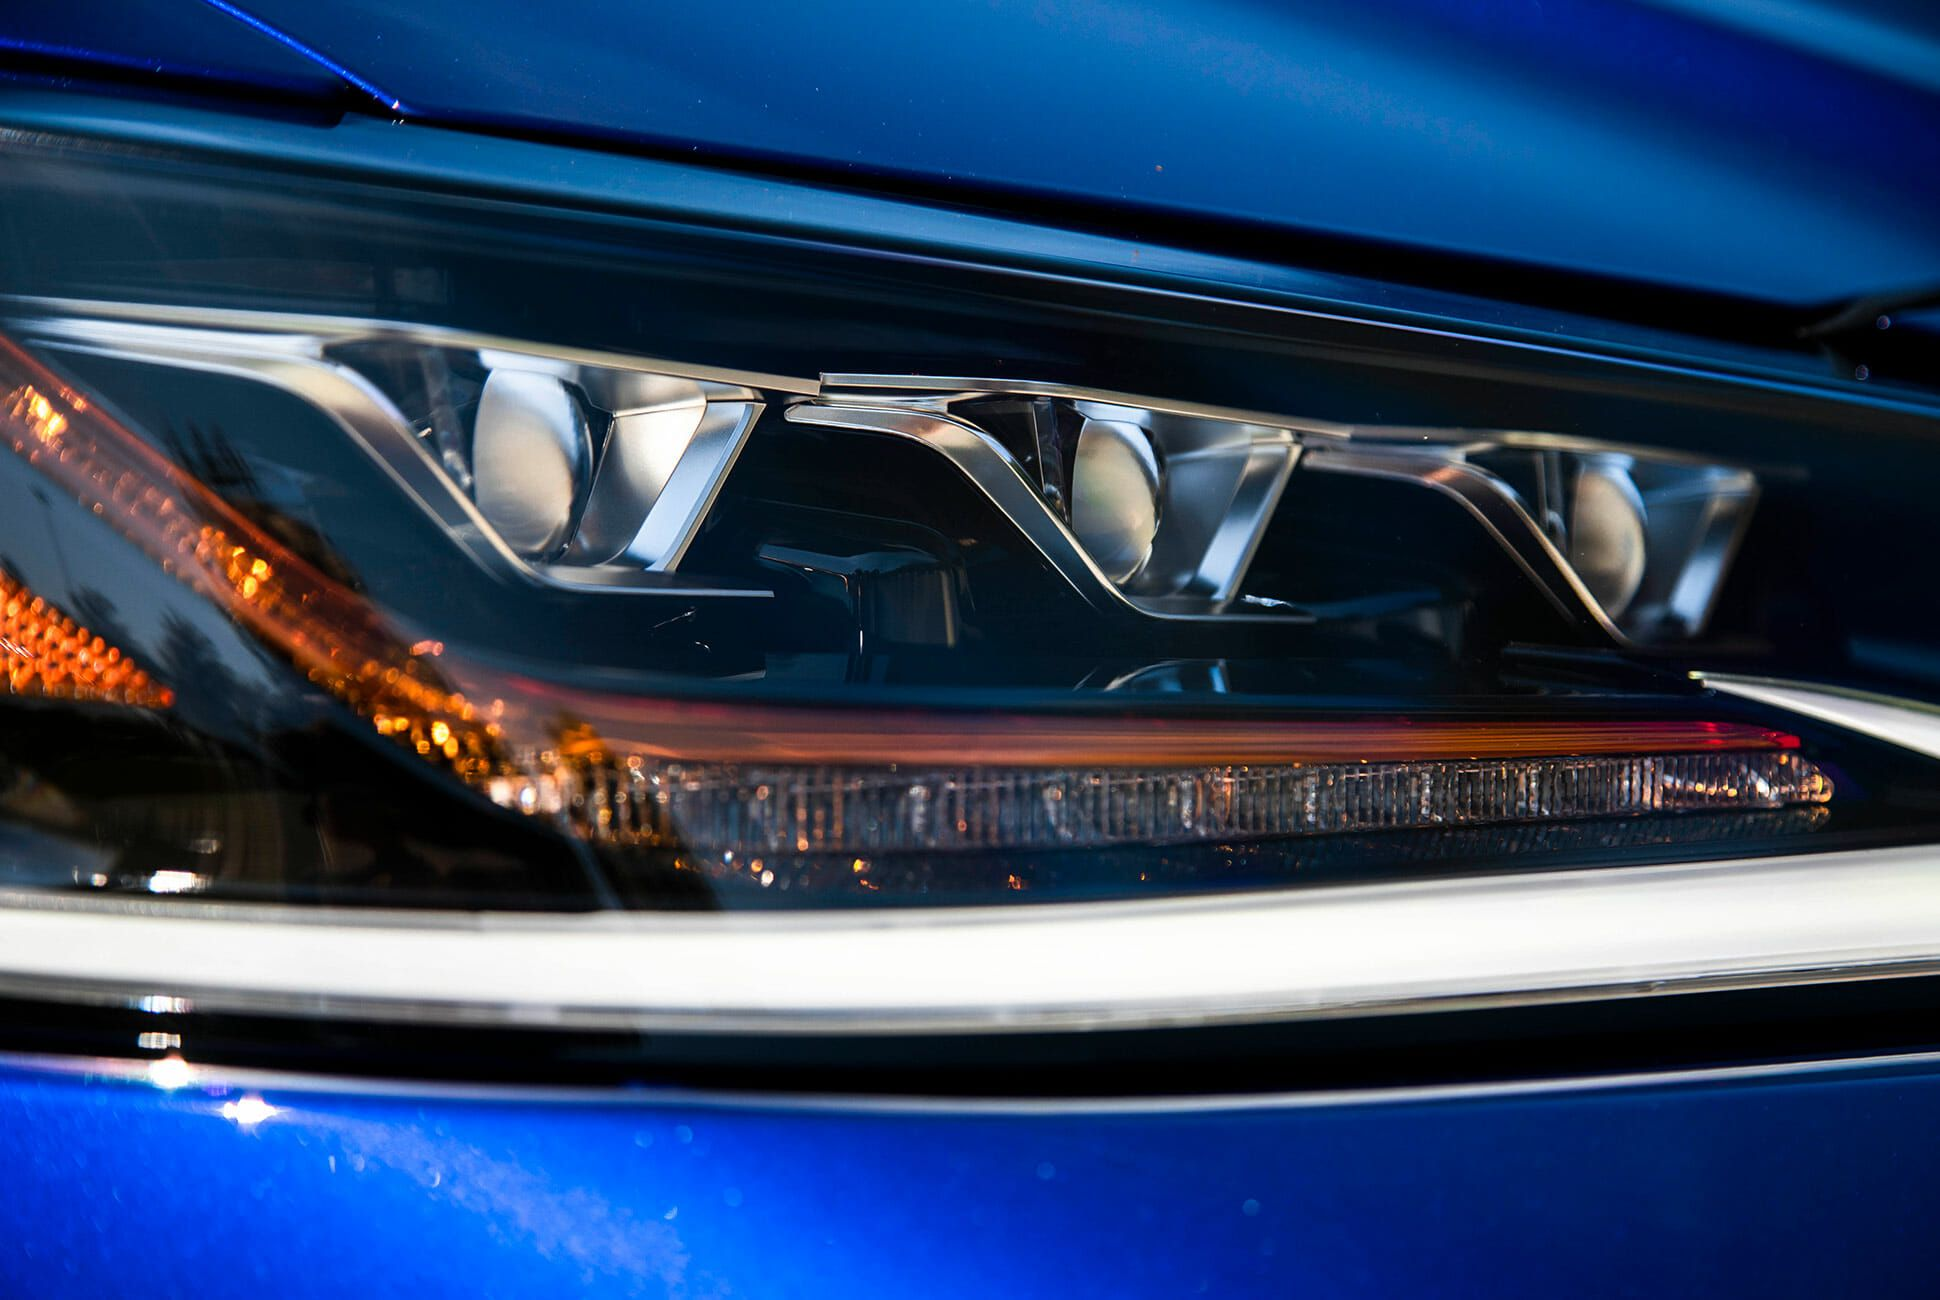 2019-Lexus-ES-350-F-Sport-Review-gear-patrol-slide-6